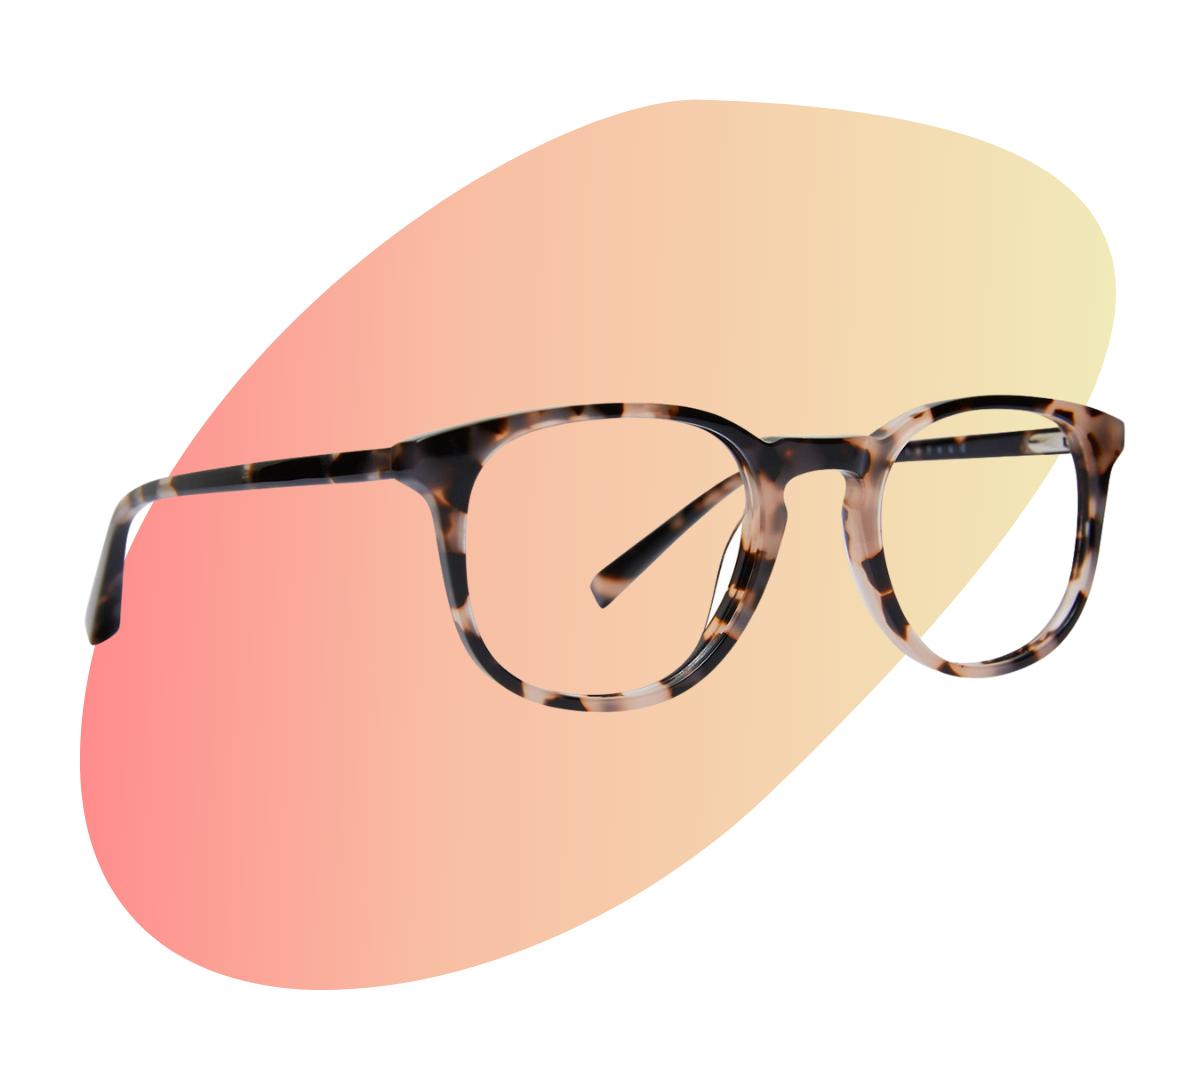 baxter blue Lane - Quartz Tortoise blue light glasses